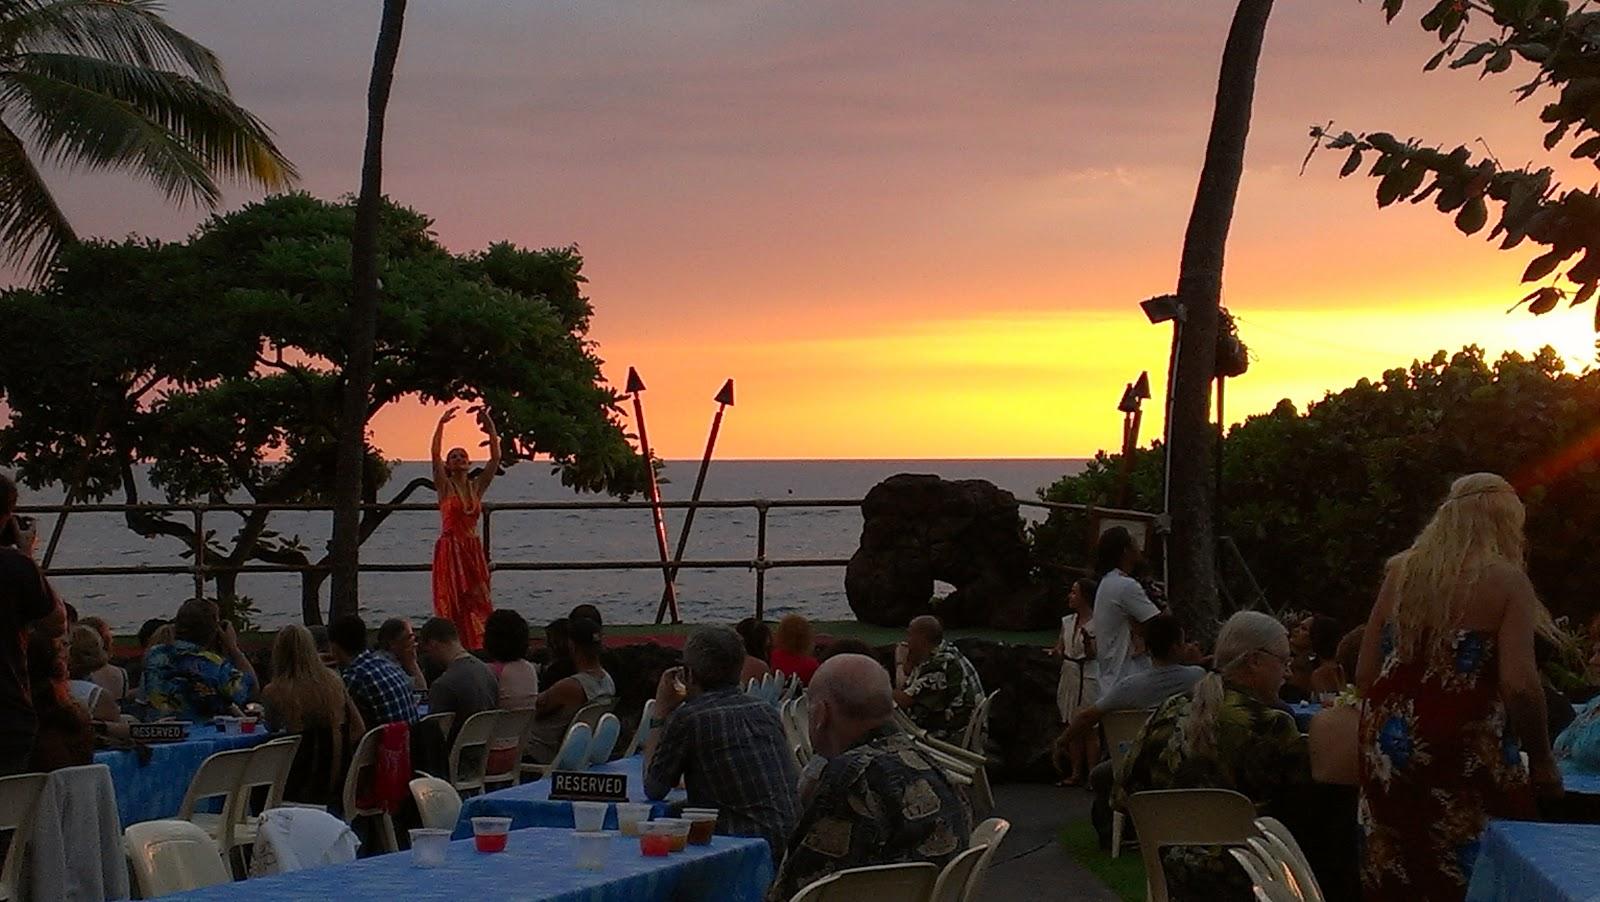 All Hawaii News: Hawaii tourism up, solar credits dim